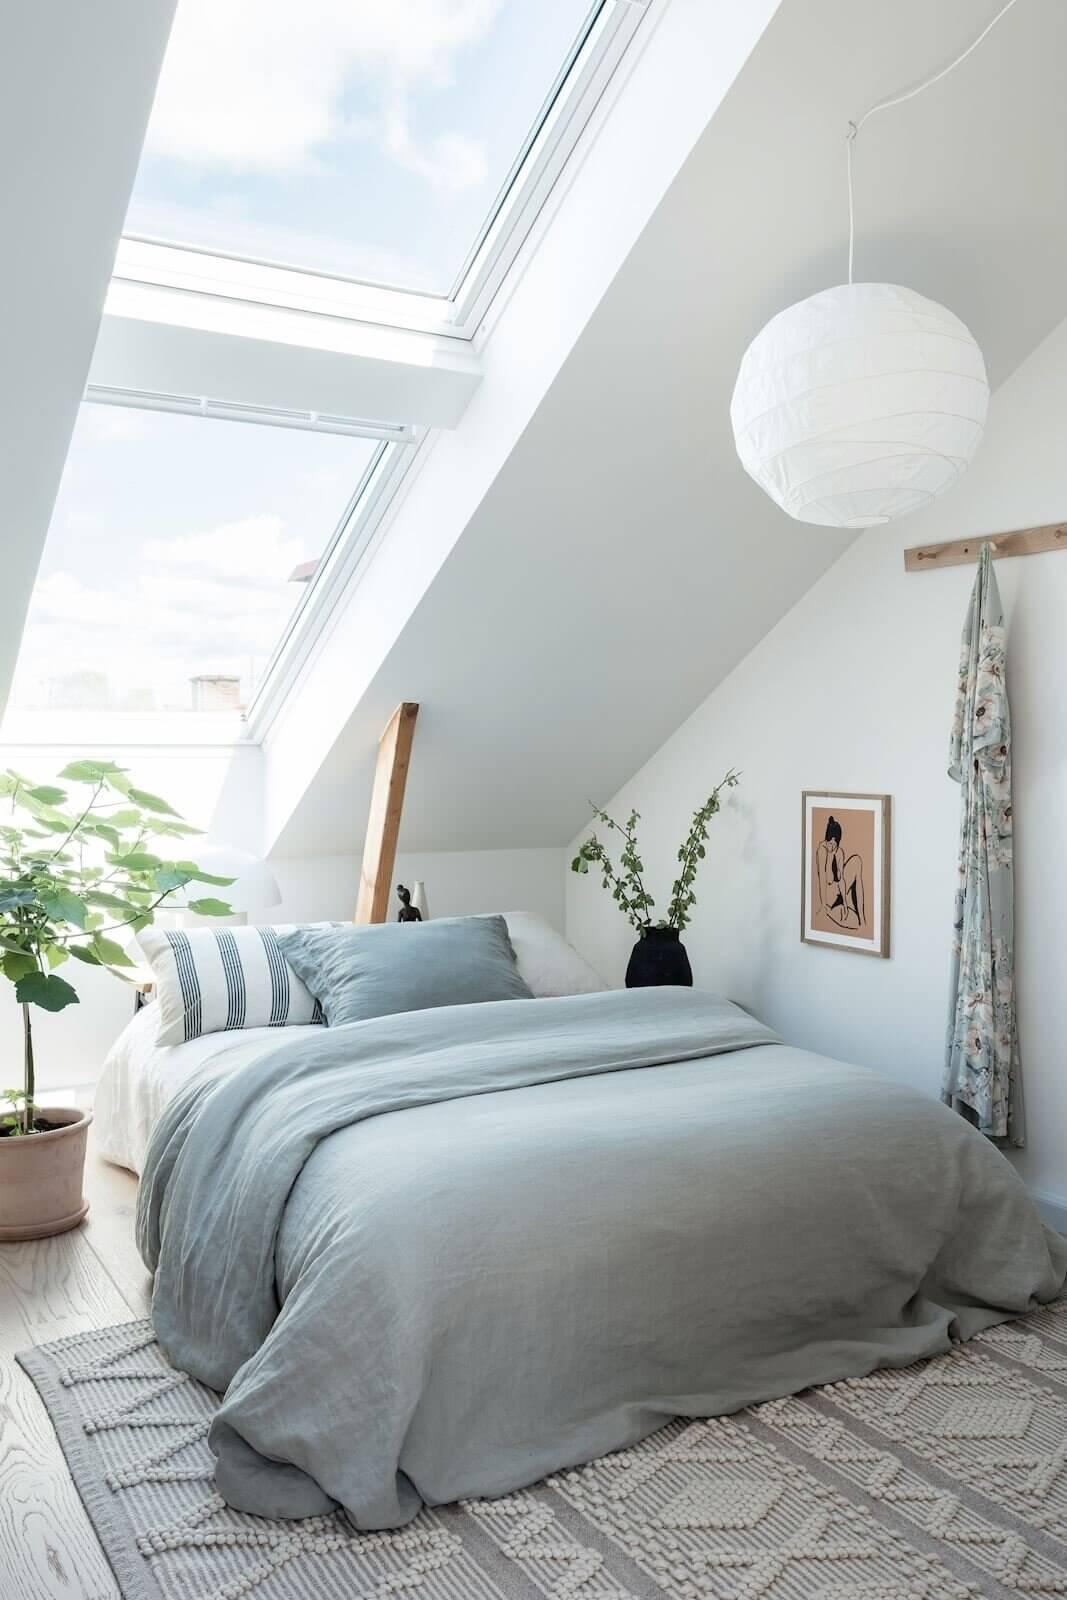 A Scandinavian Attic Apartment with Plenty of Natural Light